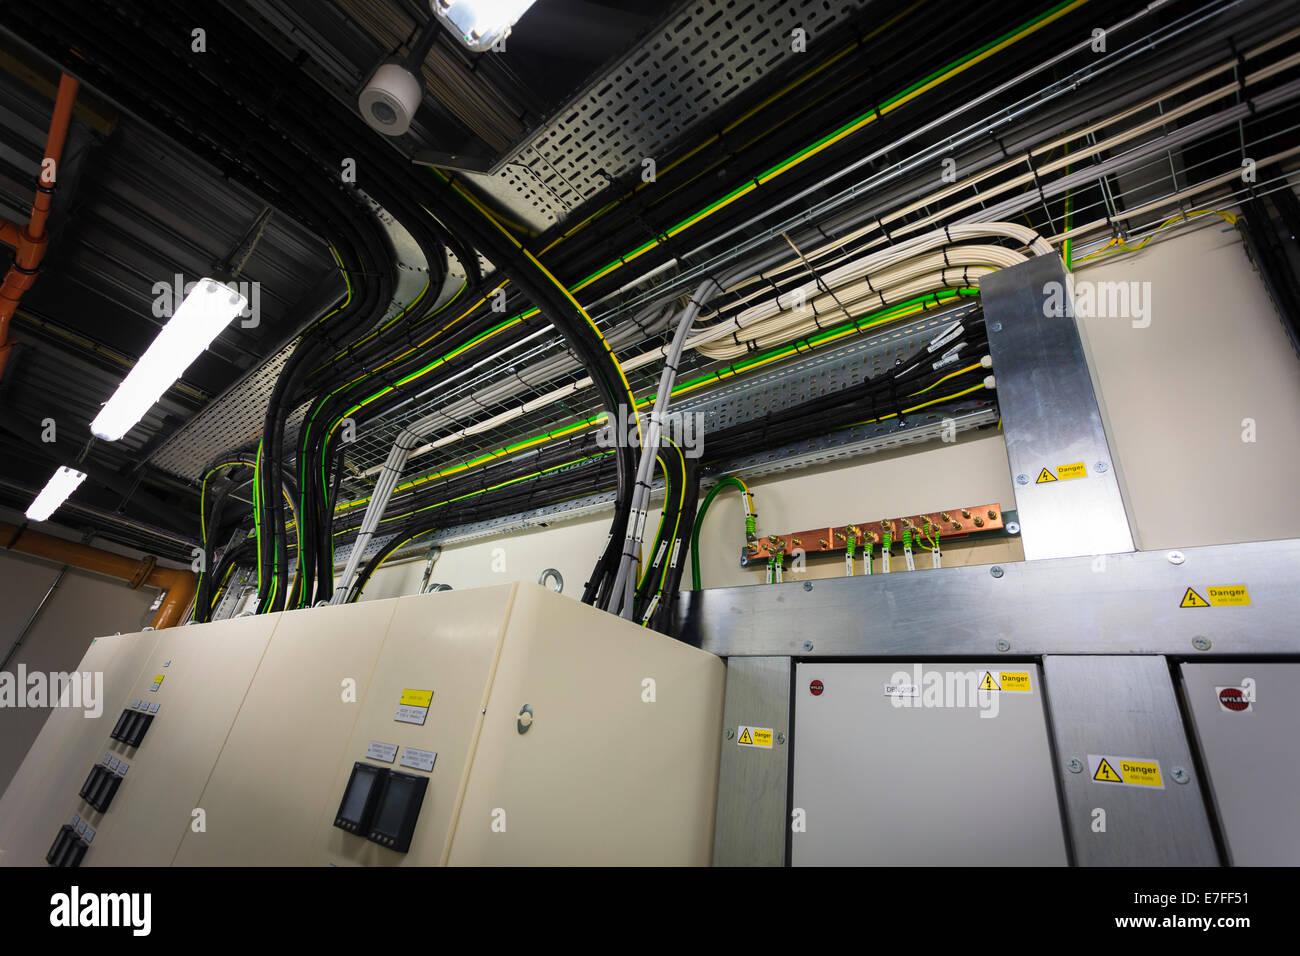 Elektrische Verkabelung Boxen im Technikraum. Stockbild